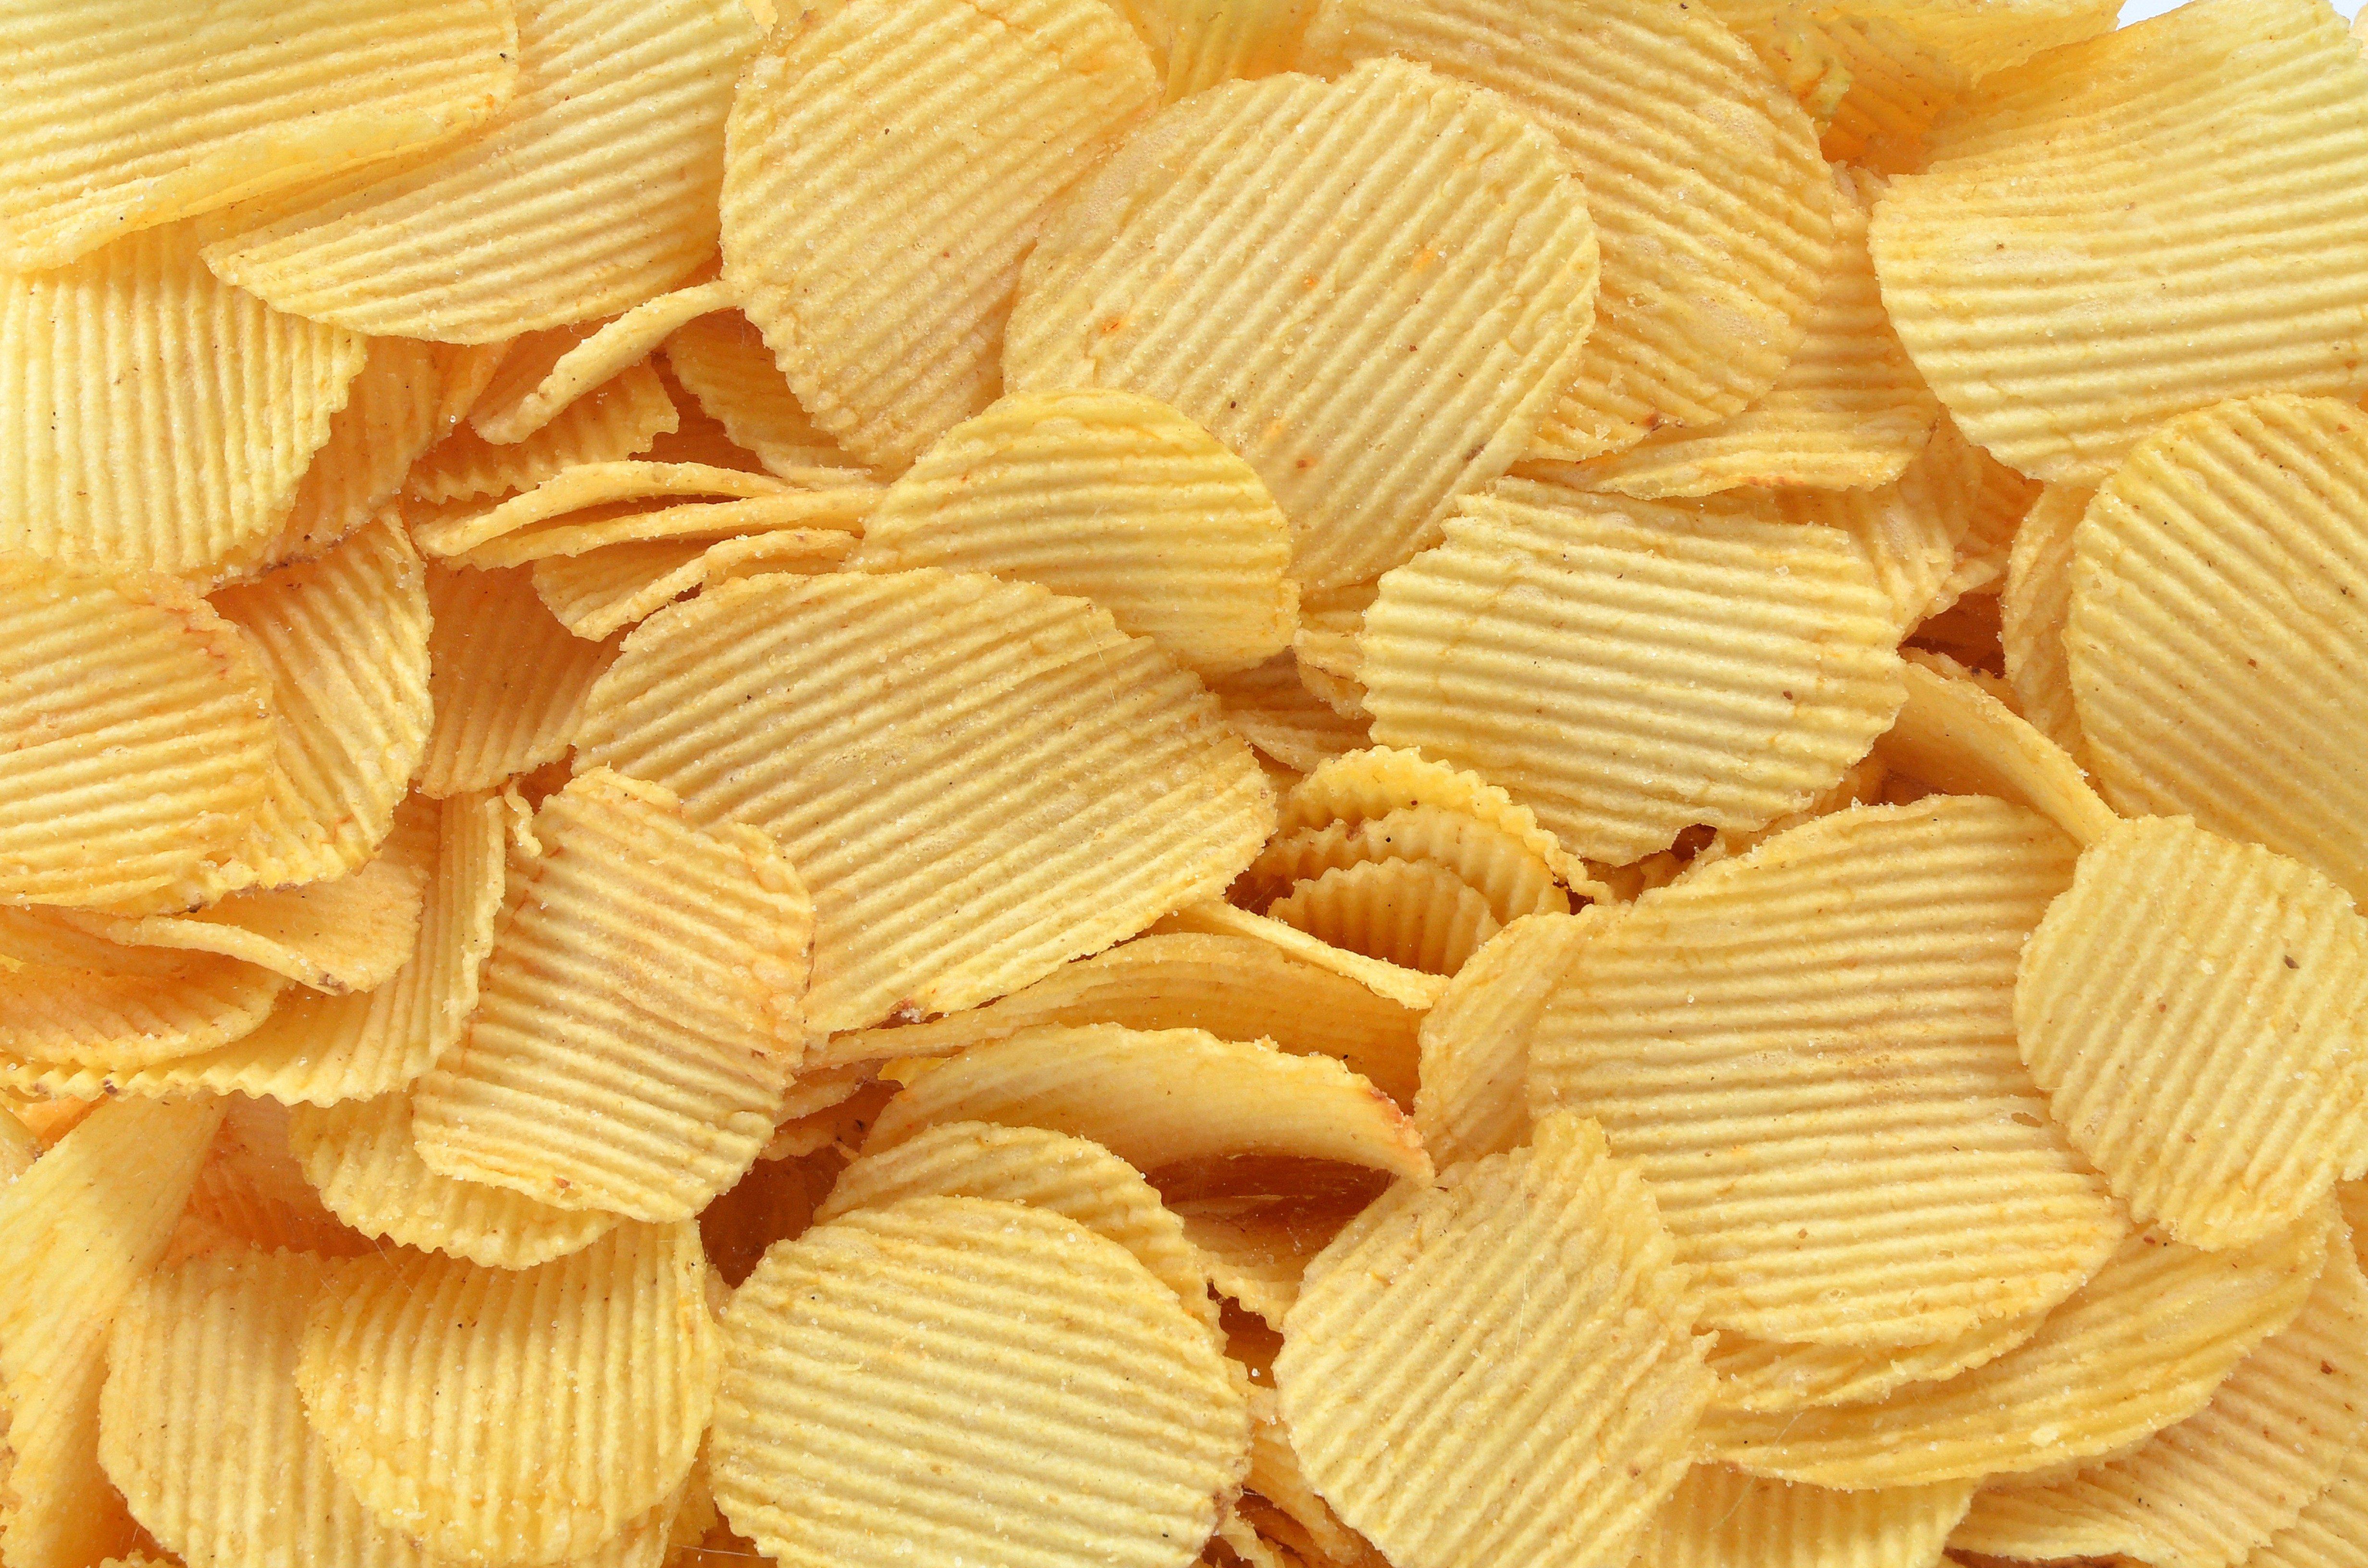 Potato chips ribbed